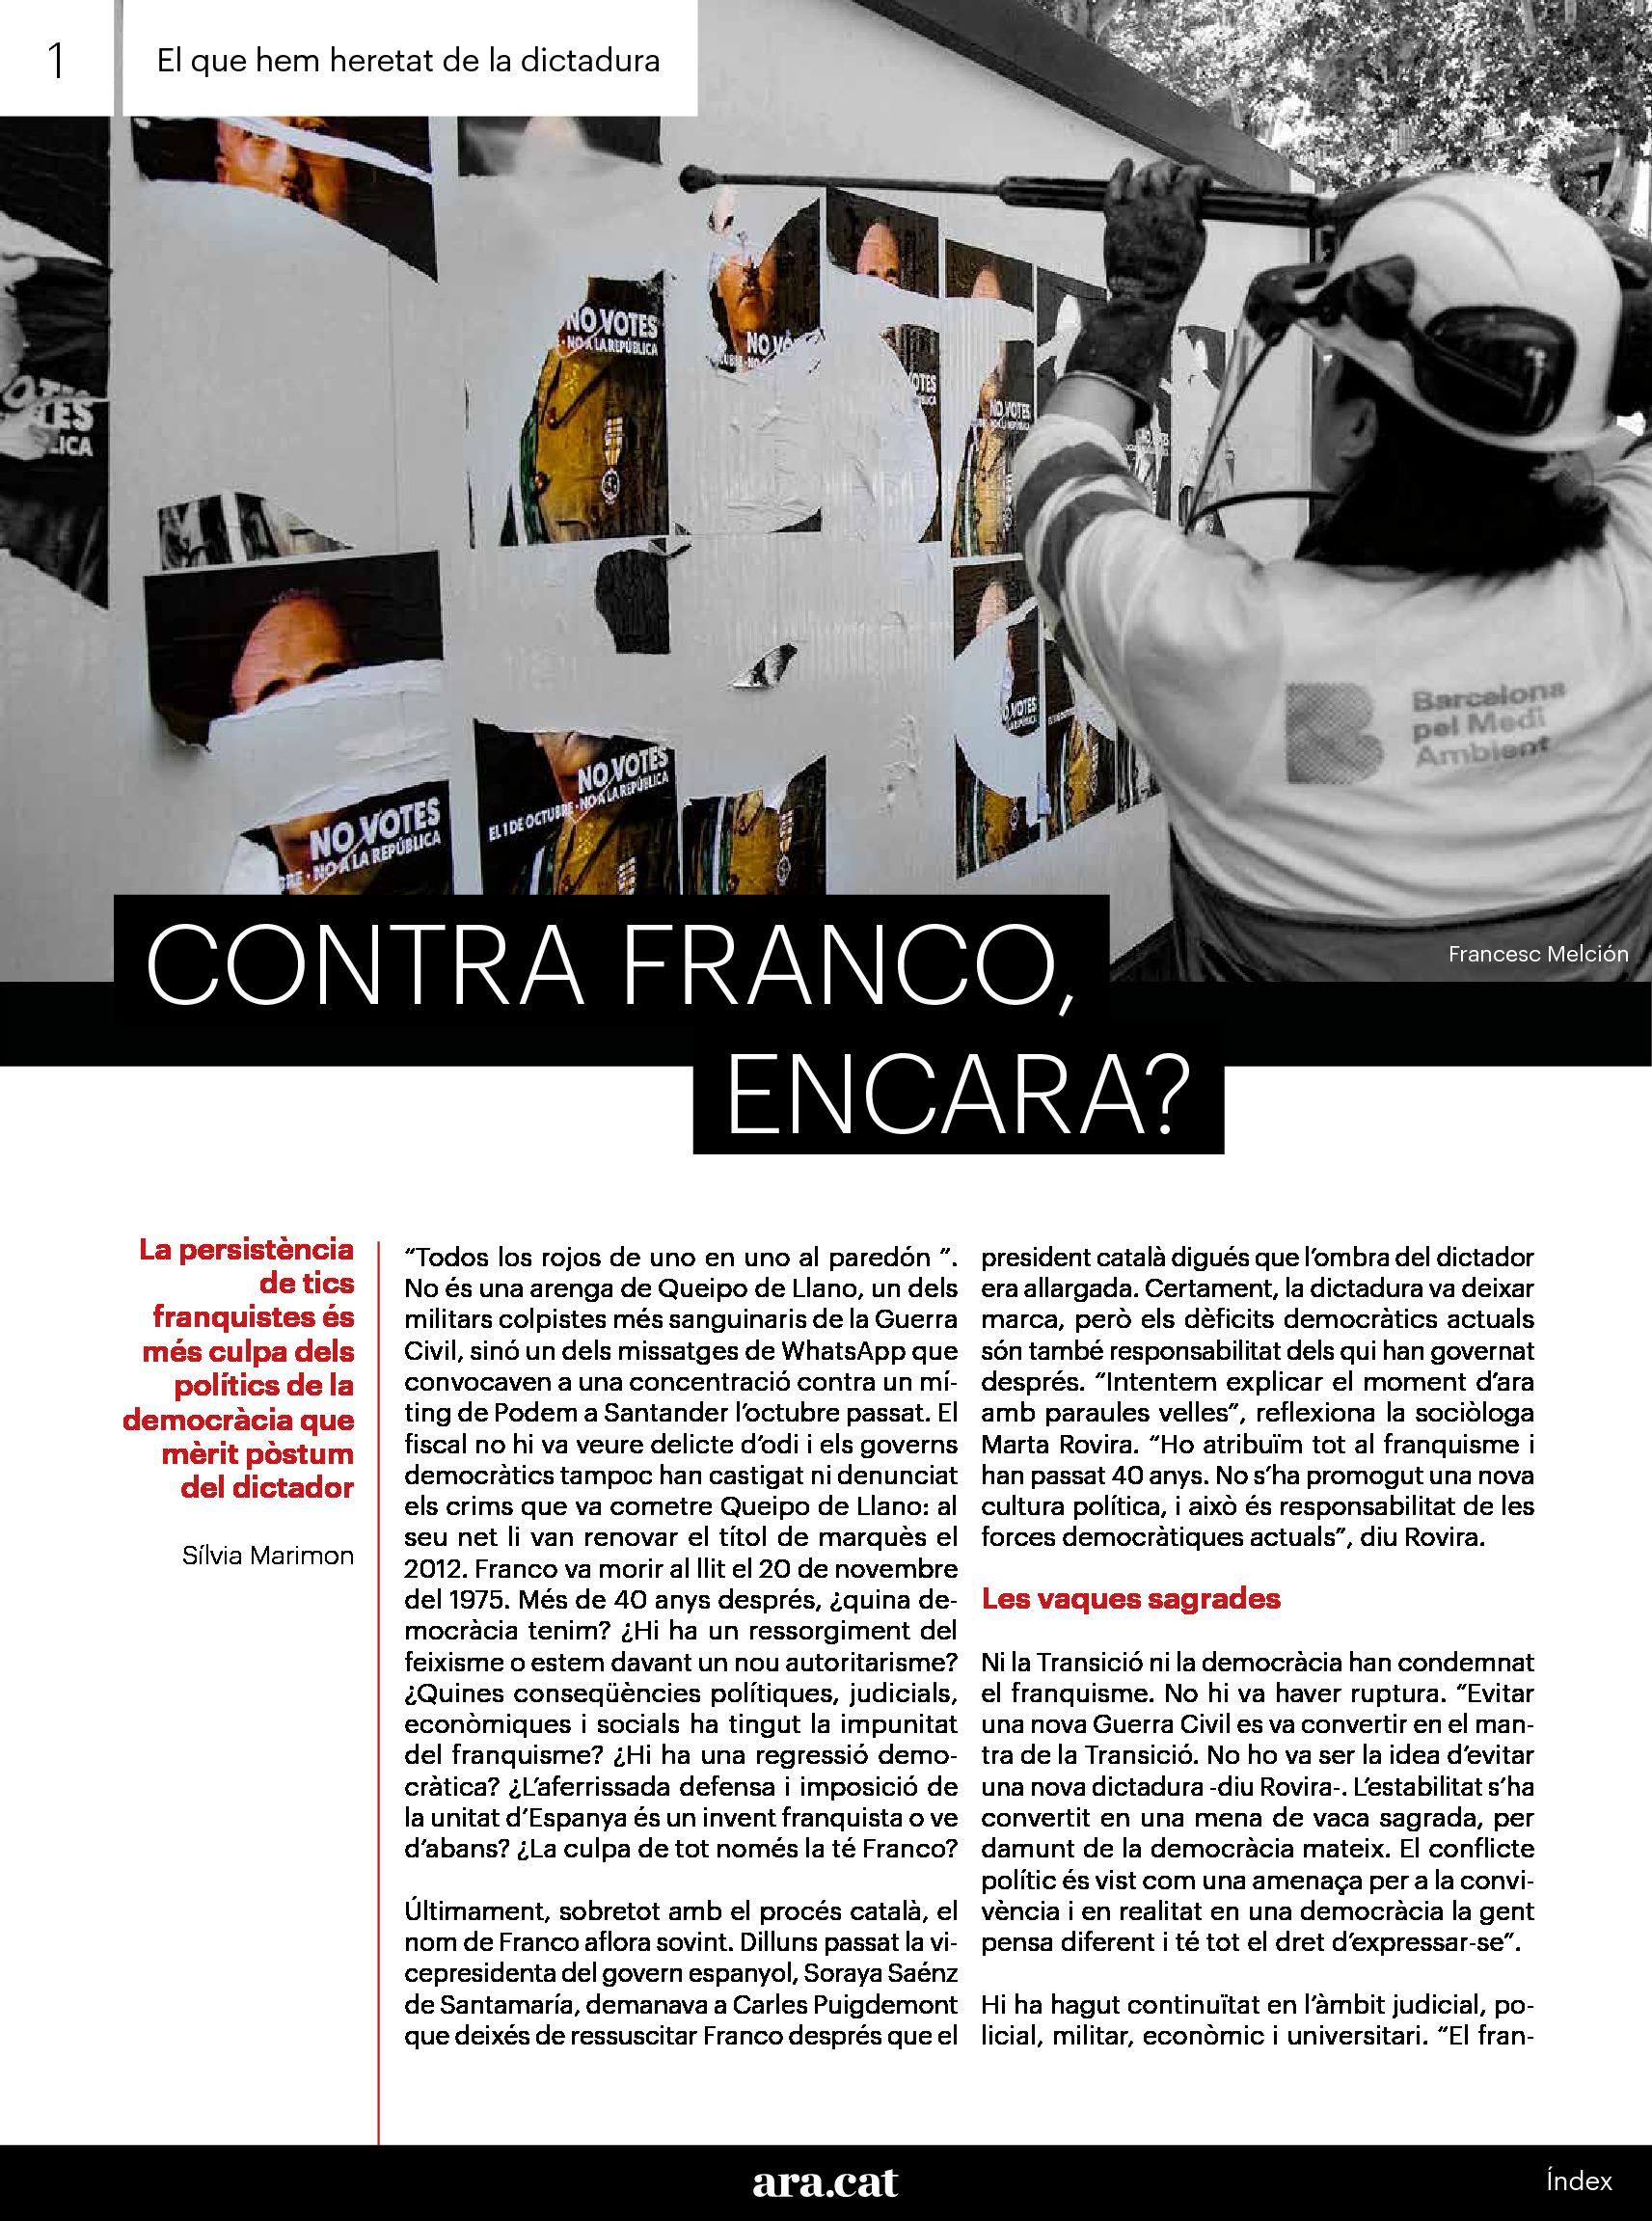 Contra Franco, encara. 2